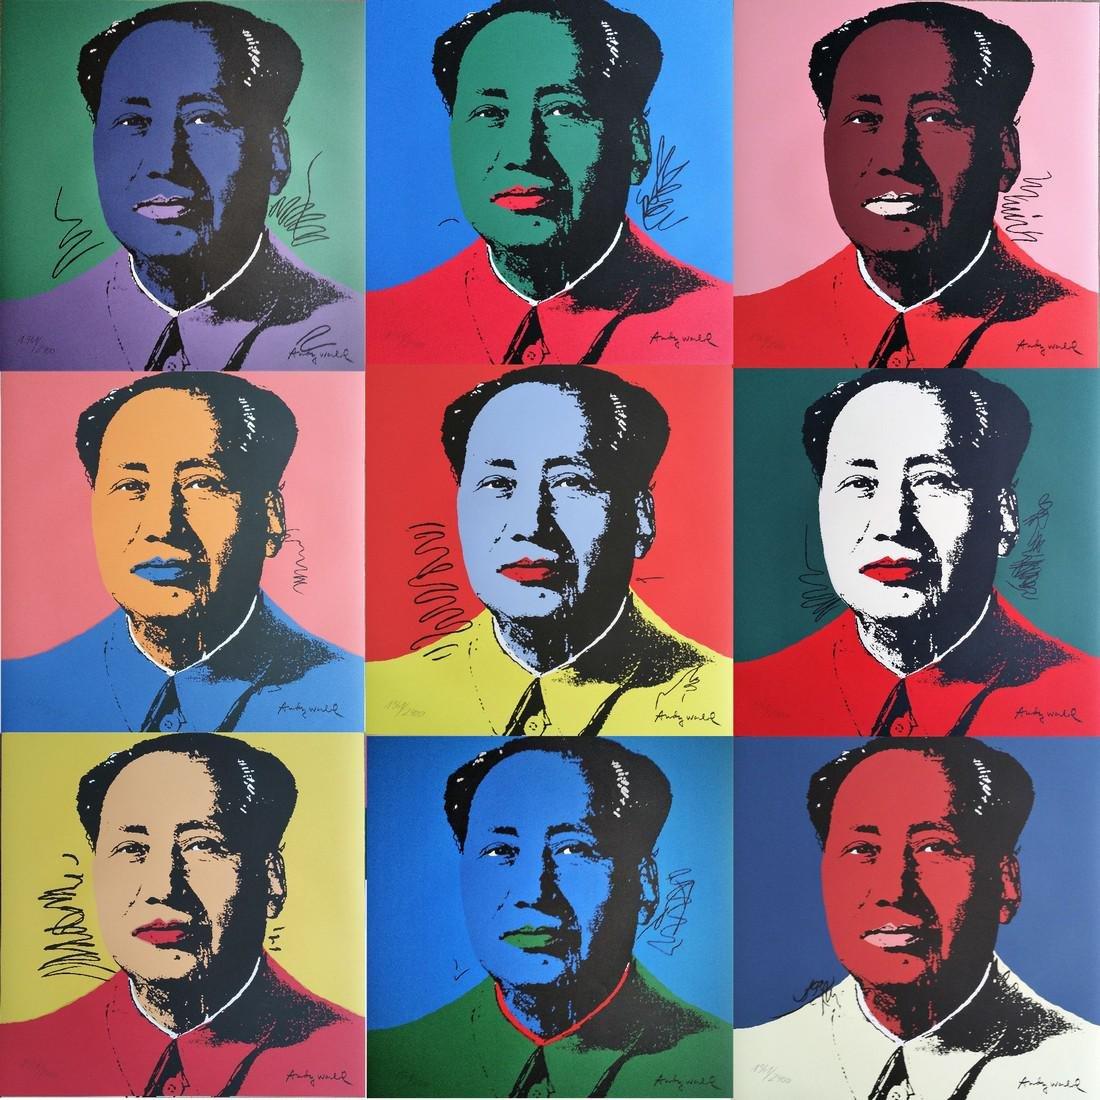 Mao Series (1967), Granolithograph - Andy Warhol